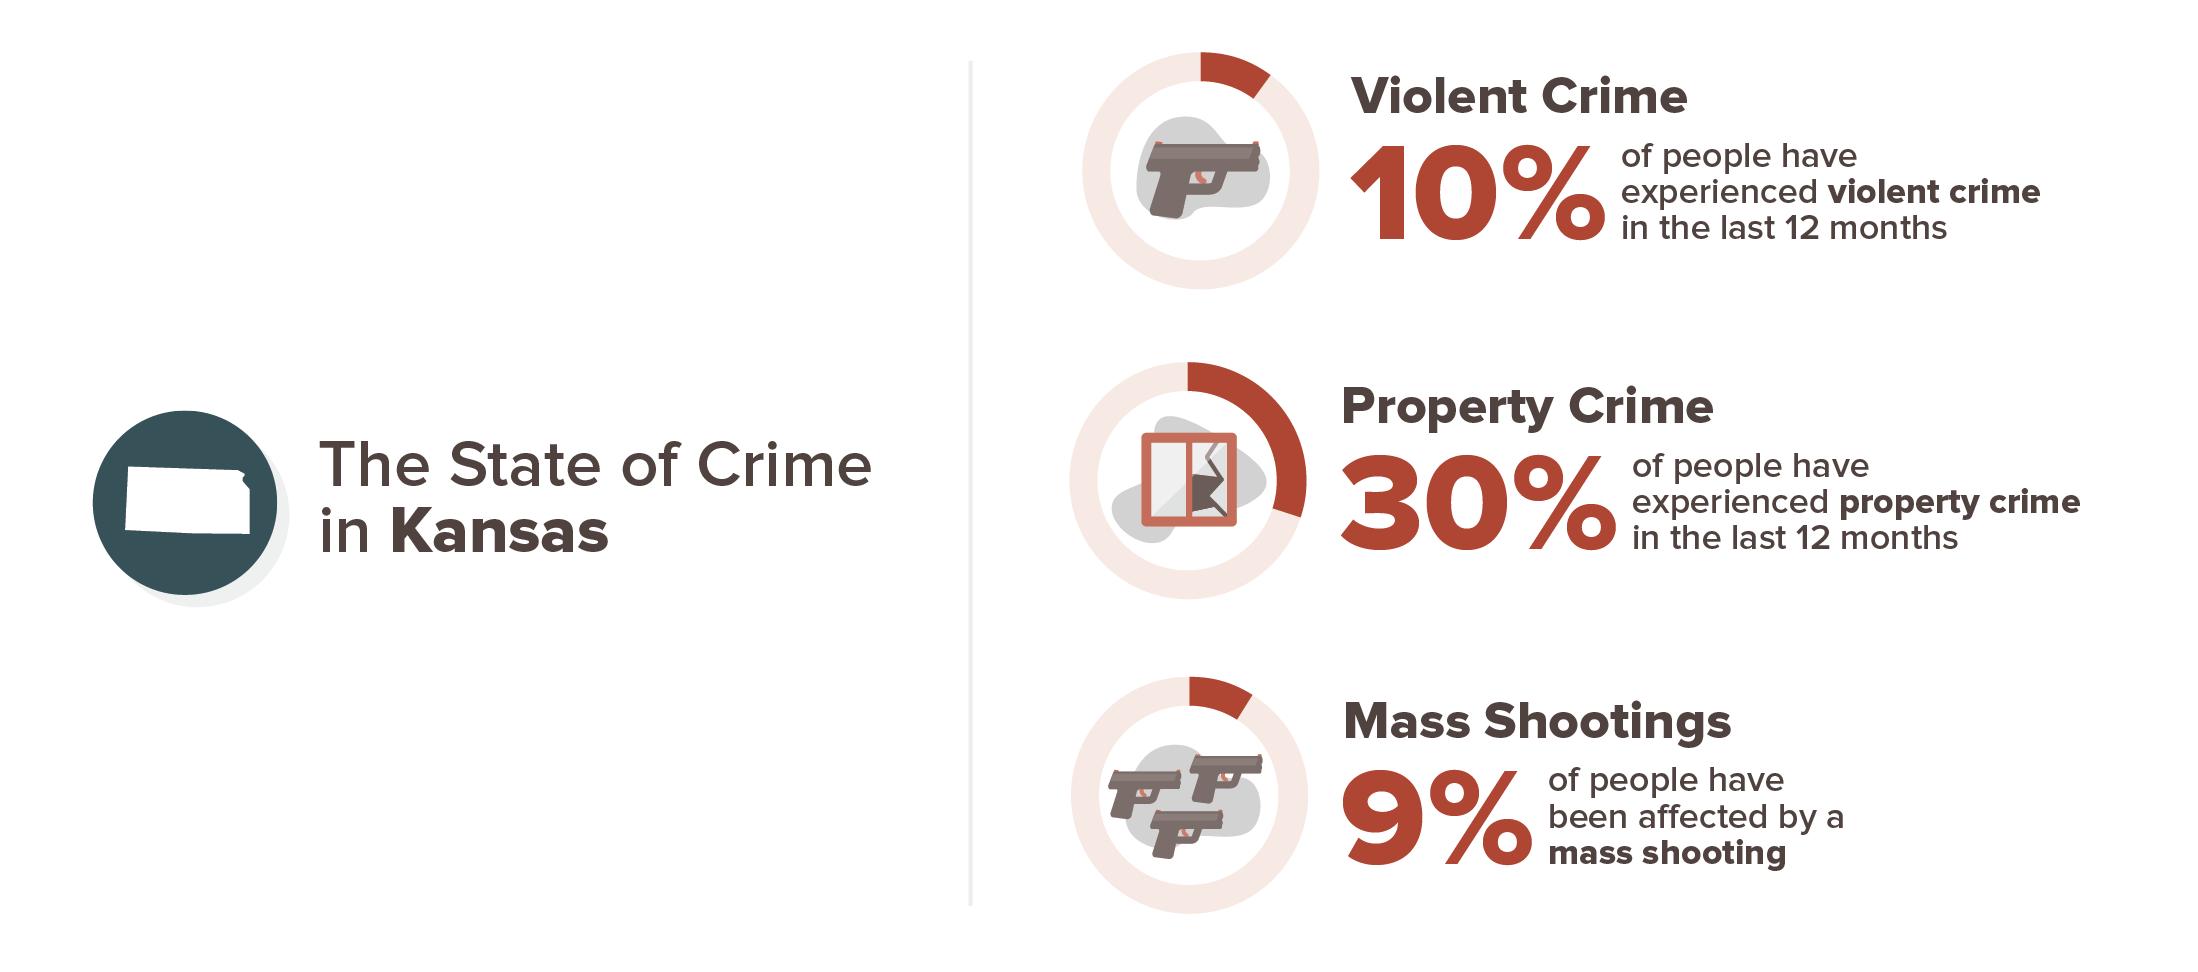 Kansas crime experience infographic; 10% violent crime, 30% property crime, 9% mass shooting